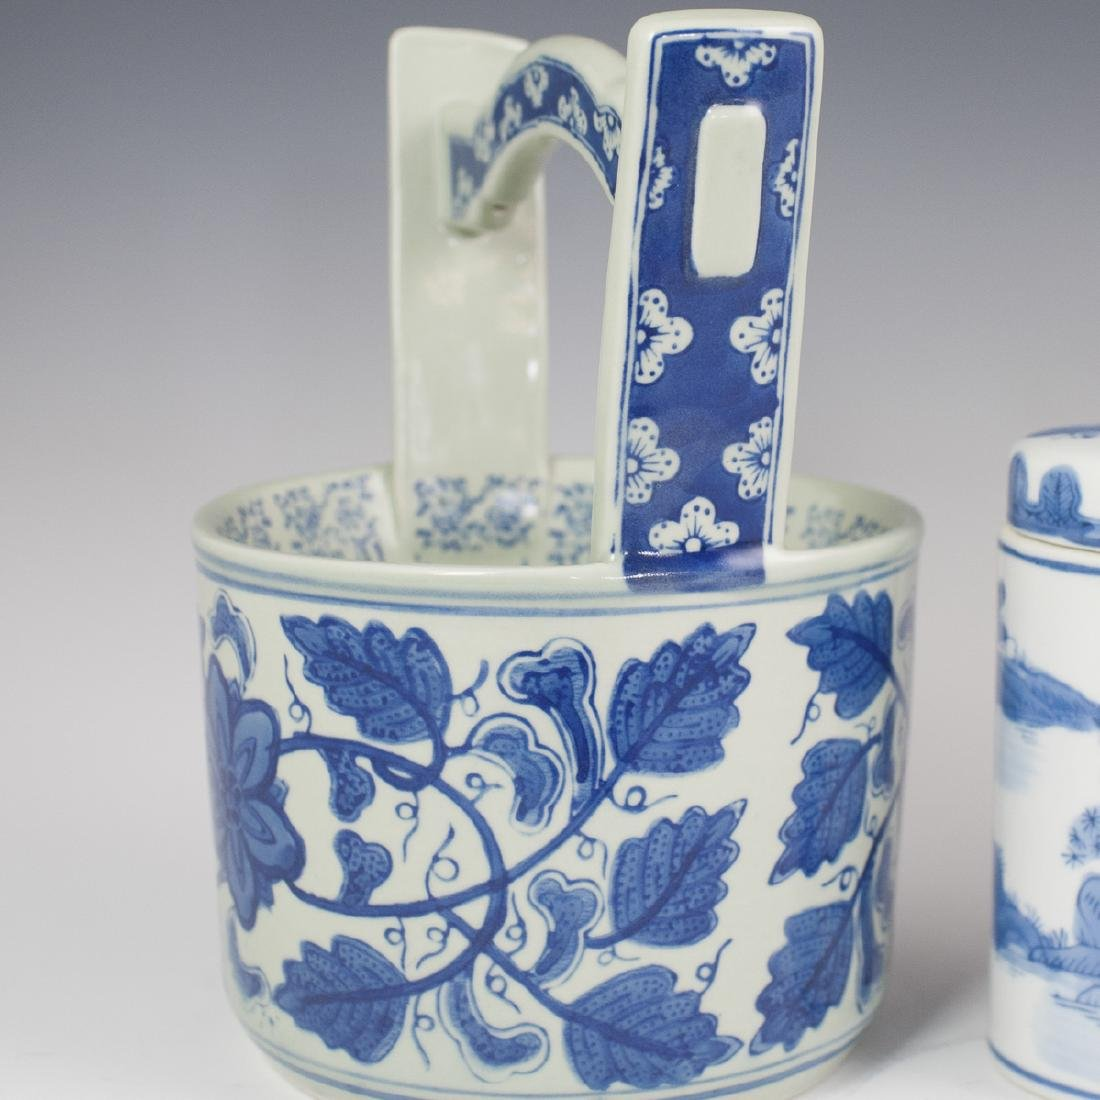 Decorative Chinese Blue & White Porcelain - 3